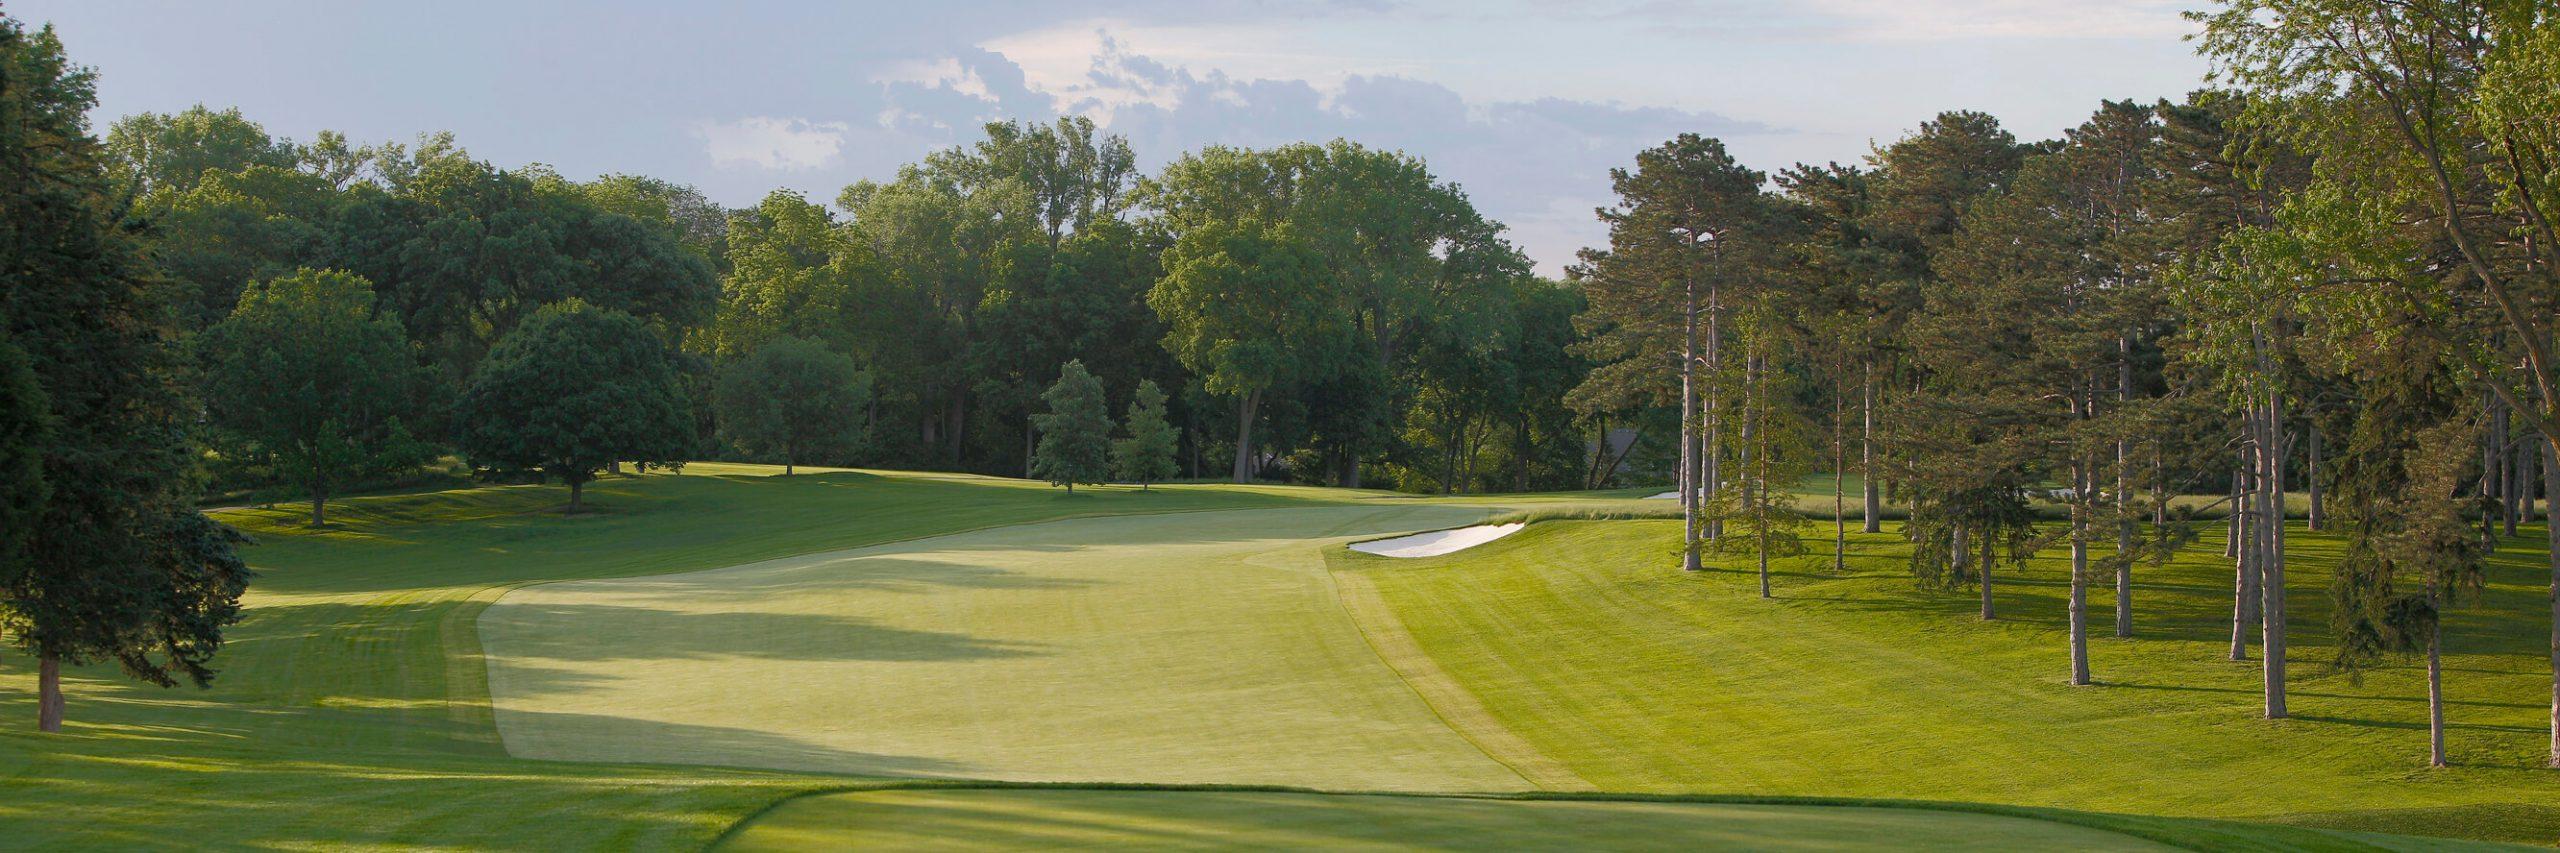 Golf Course Image - Omaha Country Club No. 1